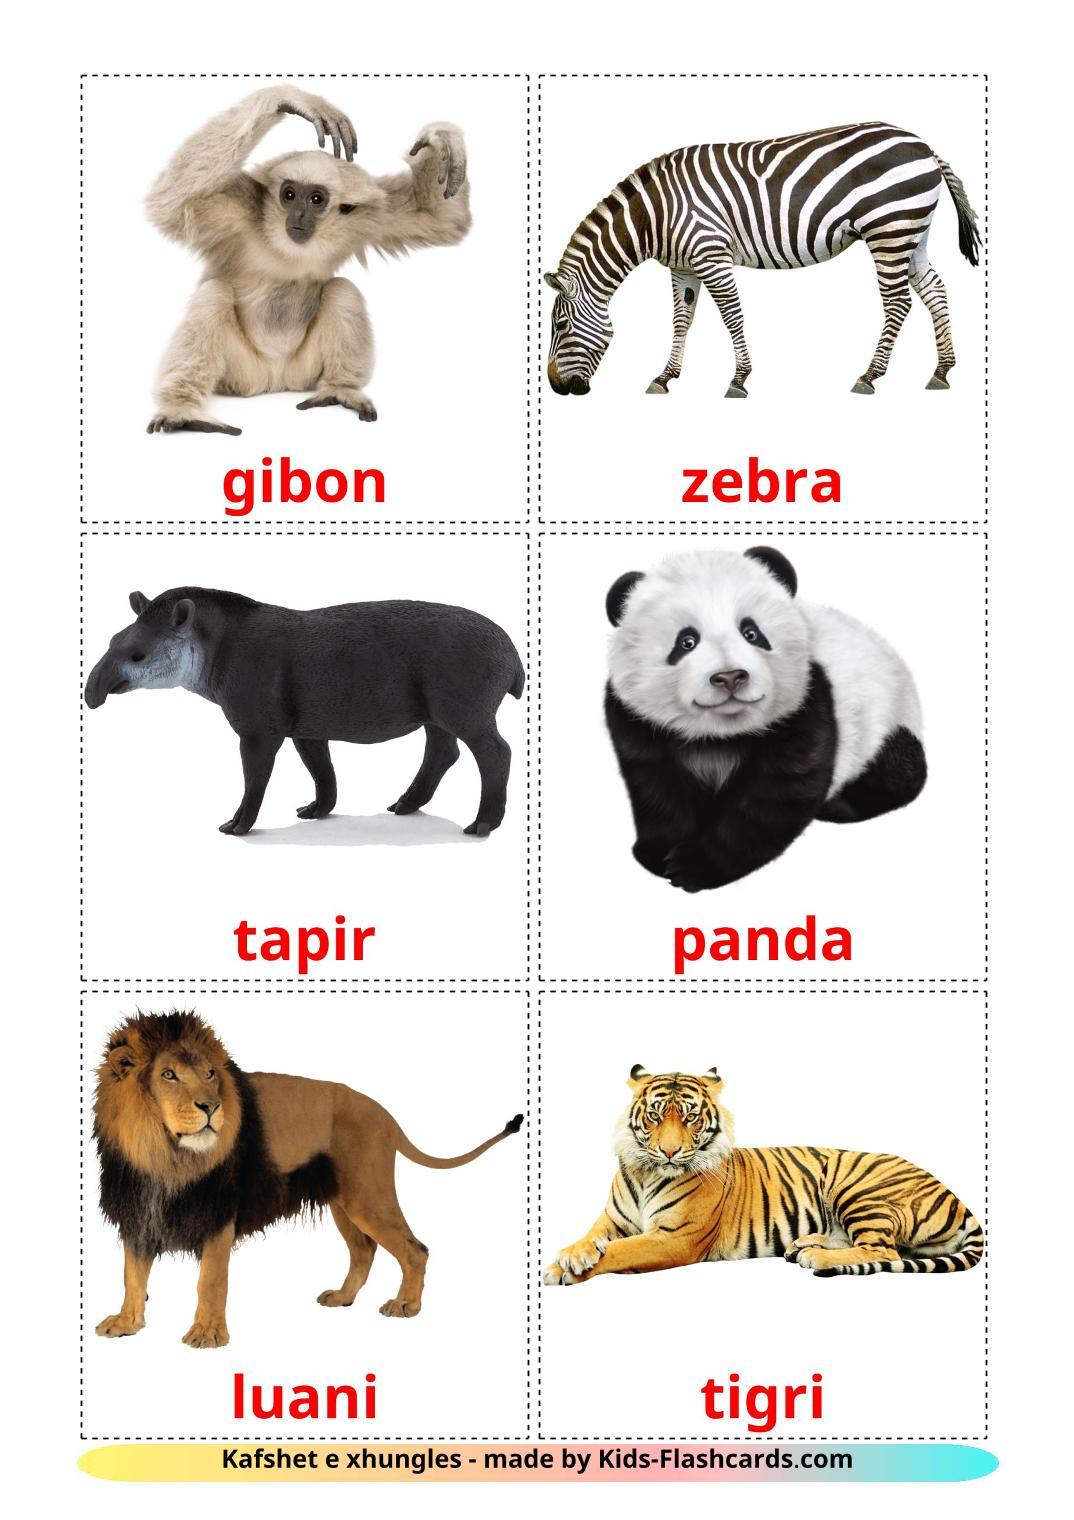 Jungle animals - 21 Free Printable albanian Flashcards